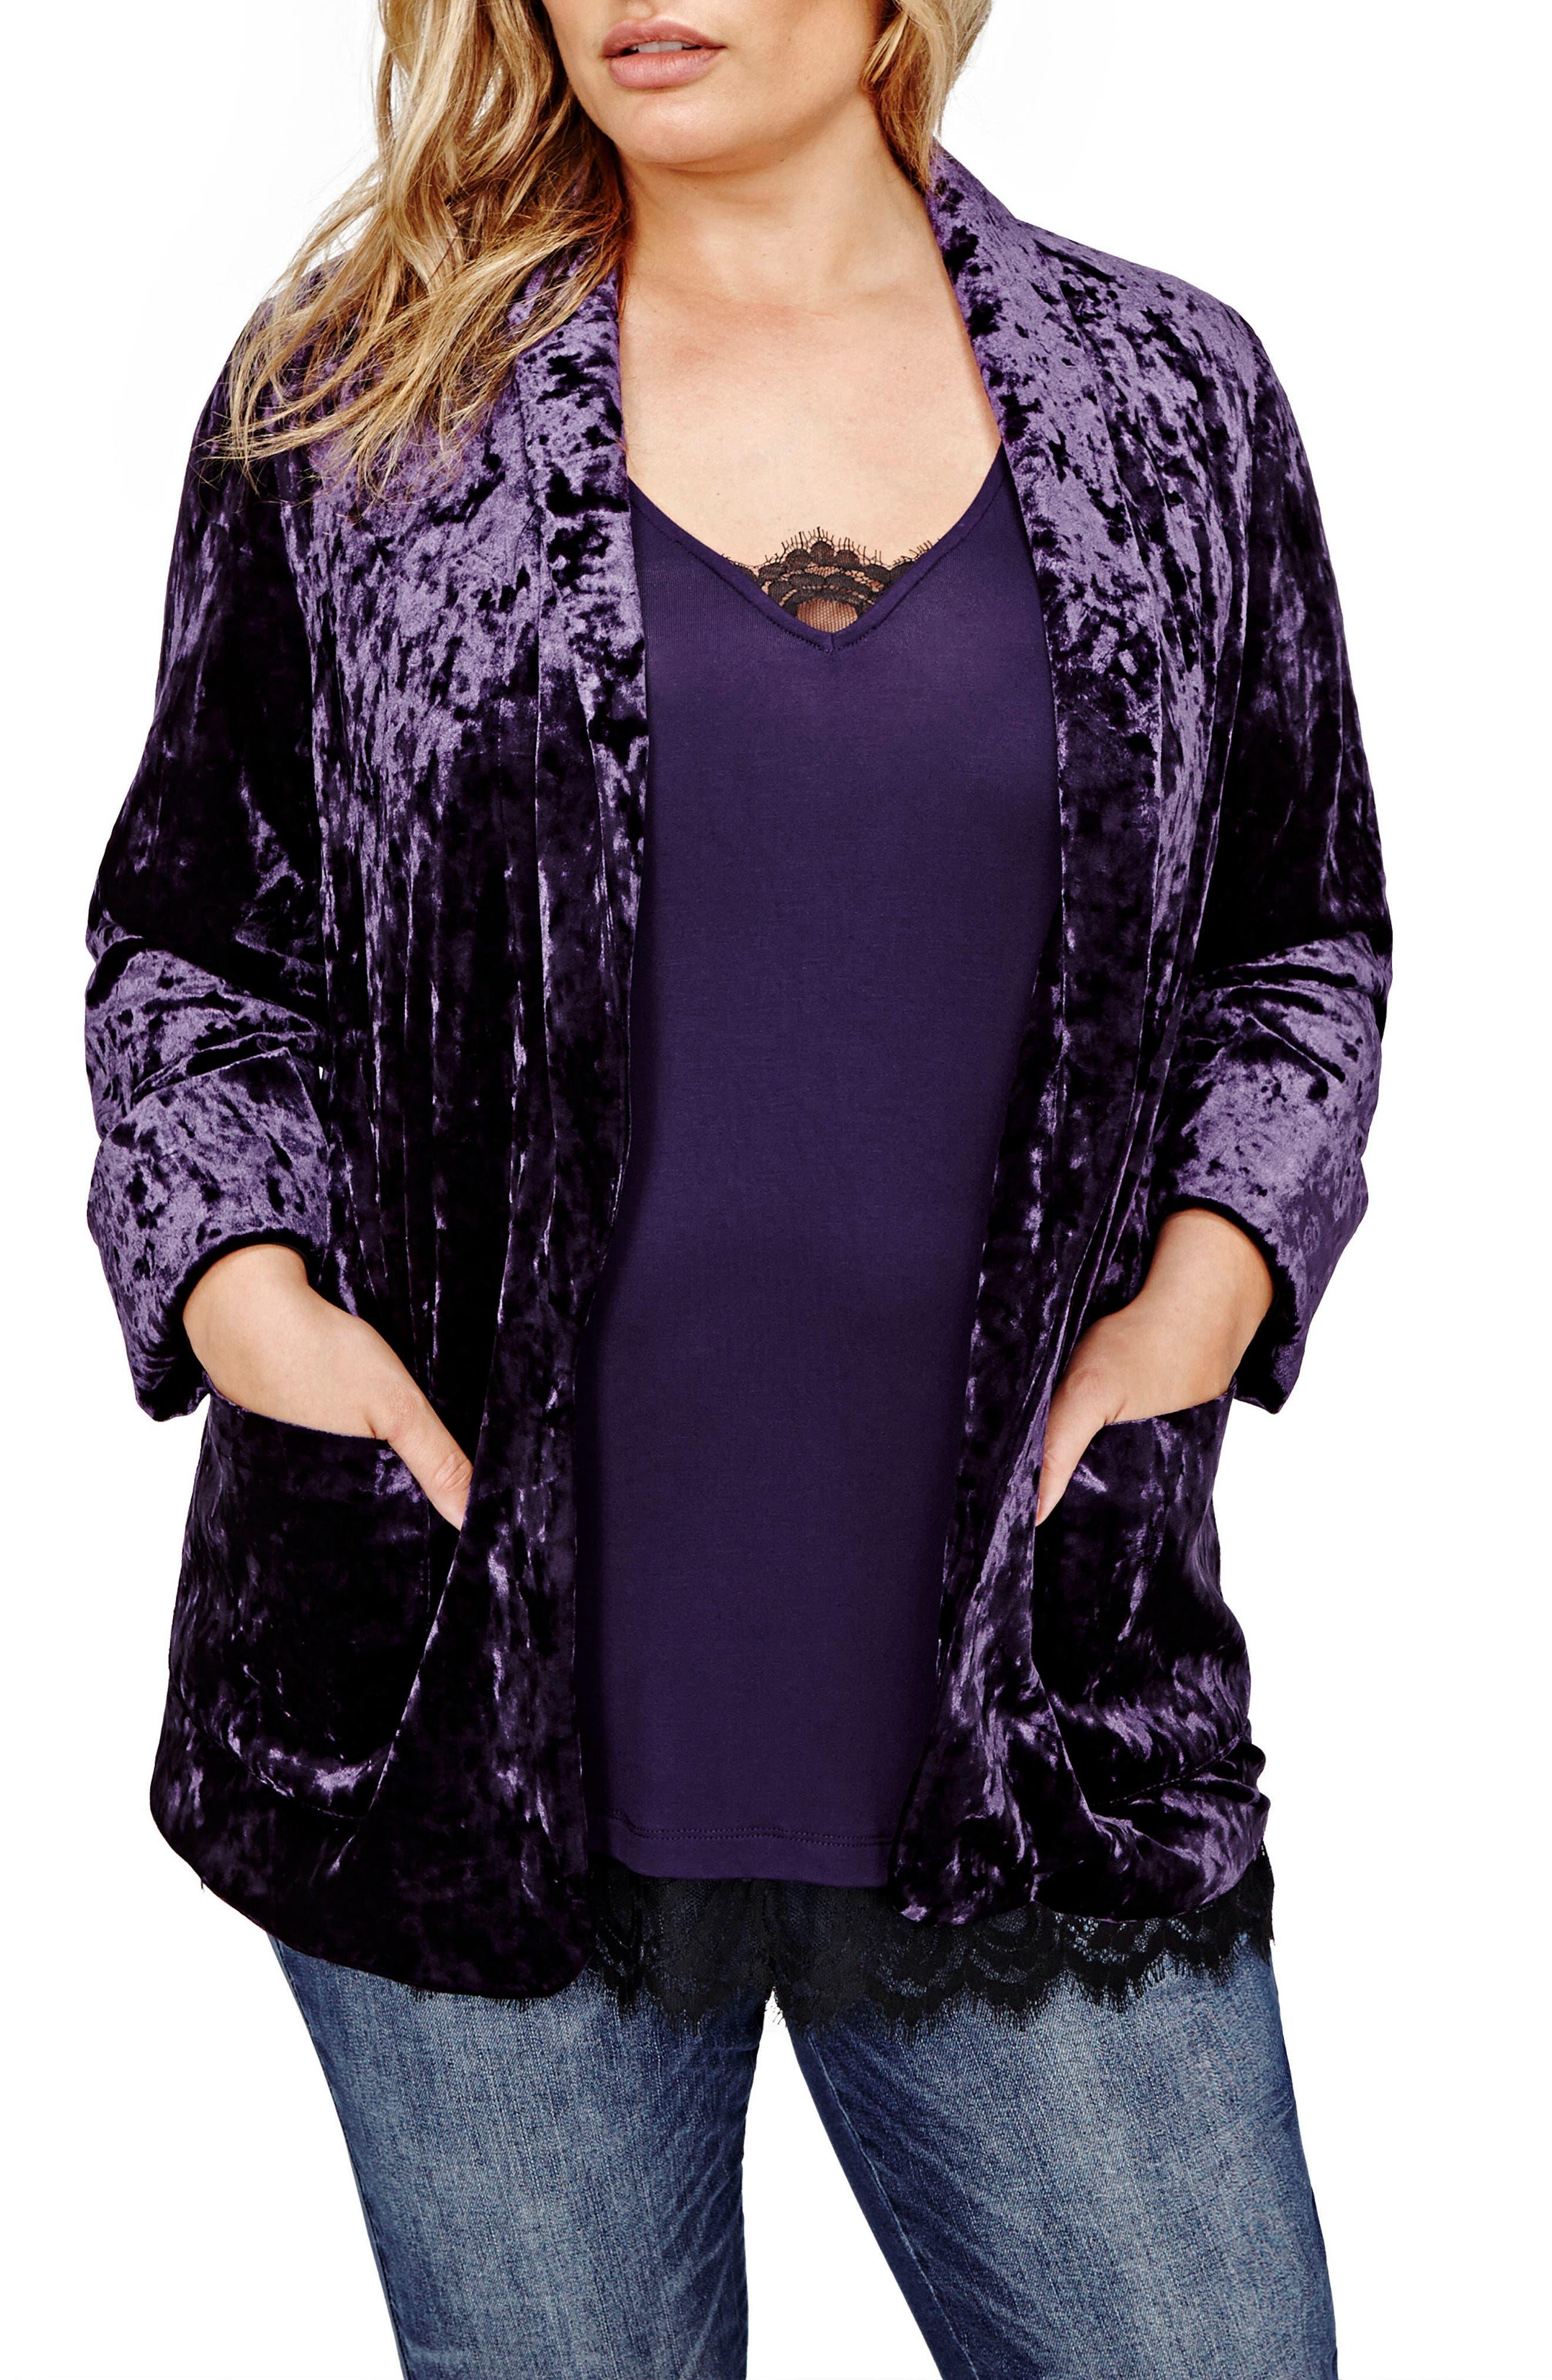 Alternate Image 1 Selected - Michel Studio Crushed Velvet One-Button Jacket (Plus Size)